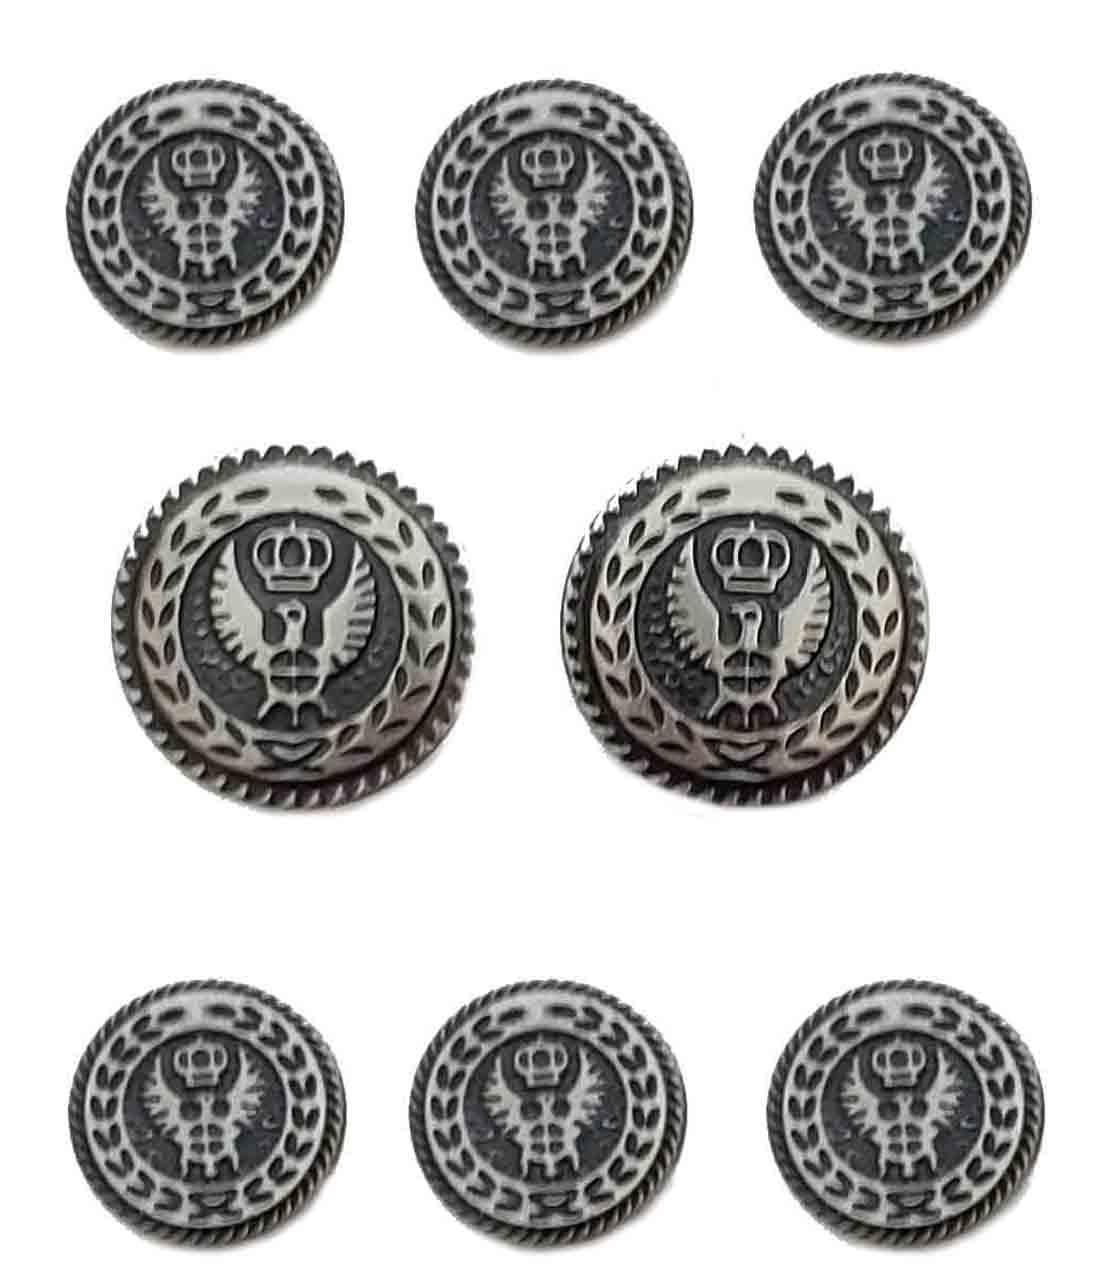 Vintage Haband Blazer Buttons Set Metal Silver Gray Eagle Crown Shank Men's